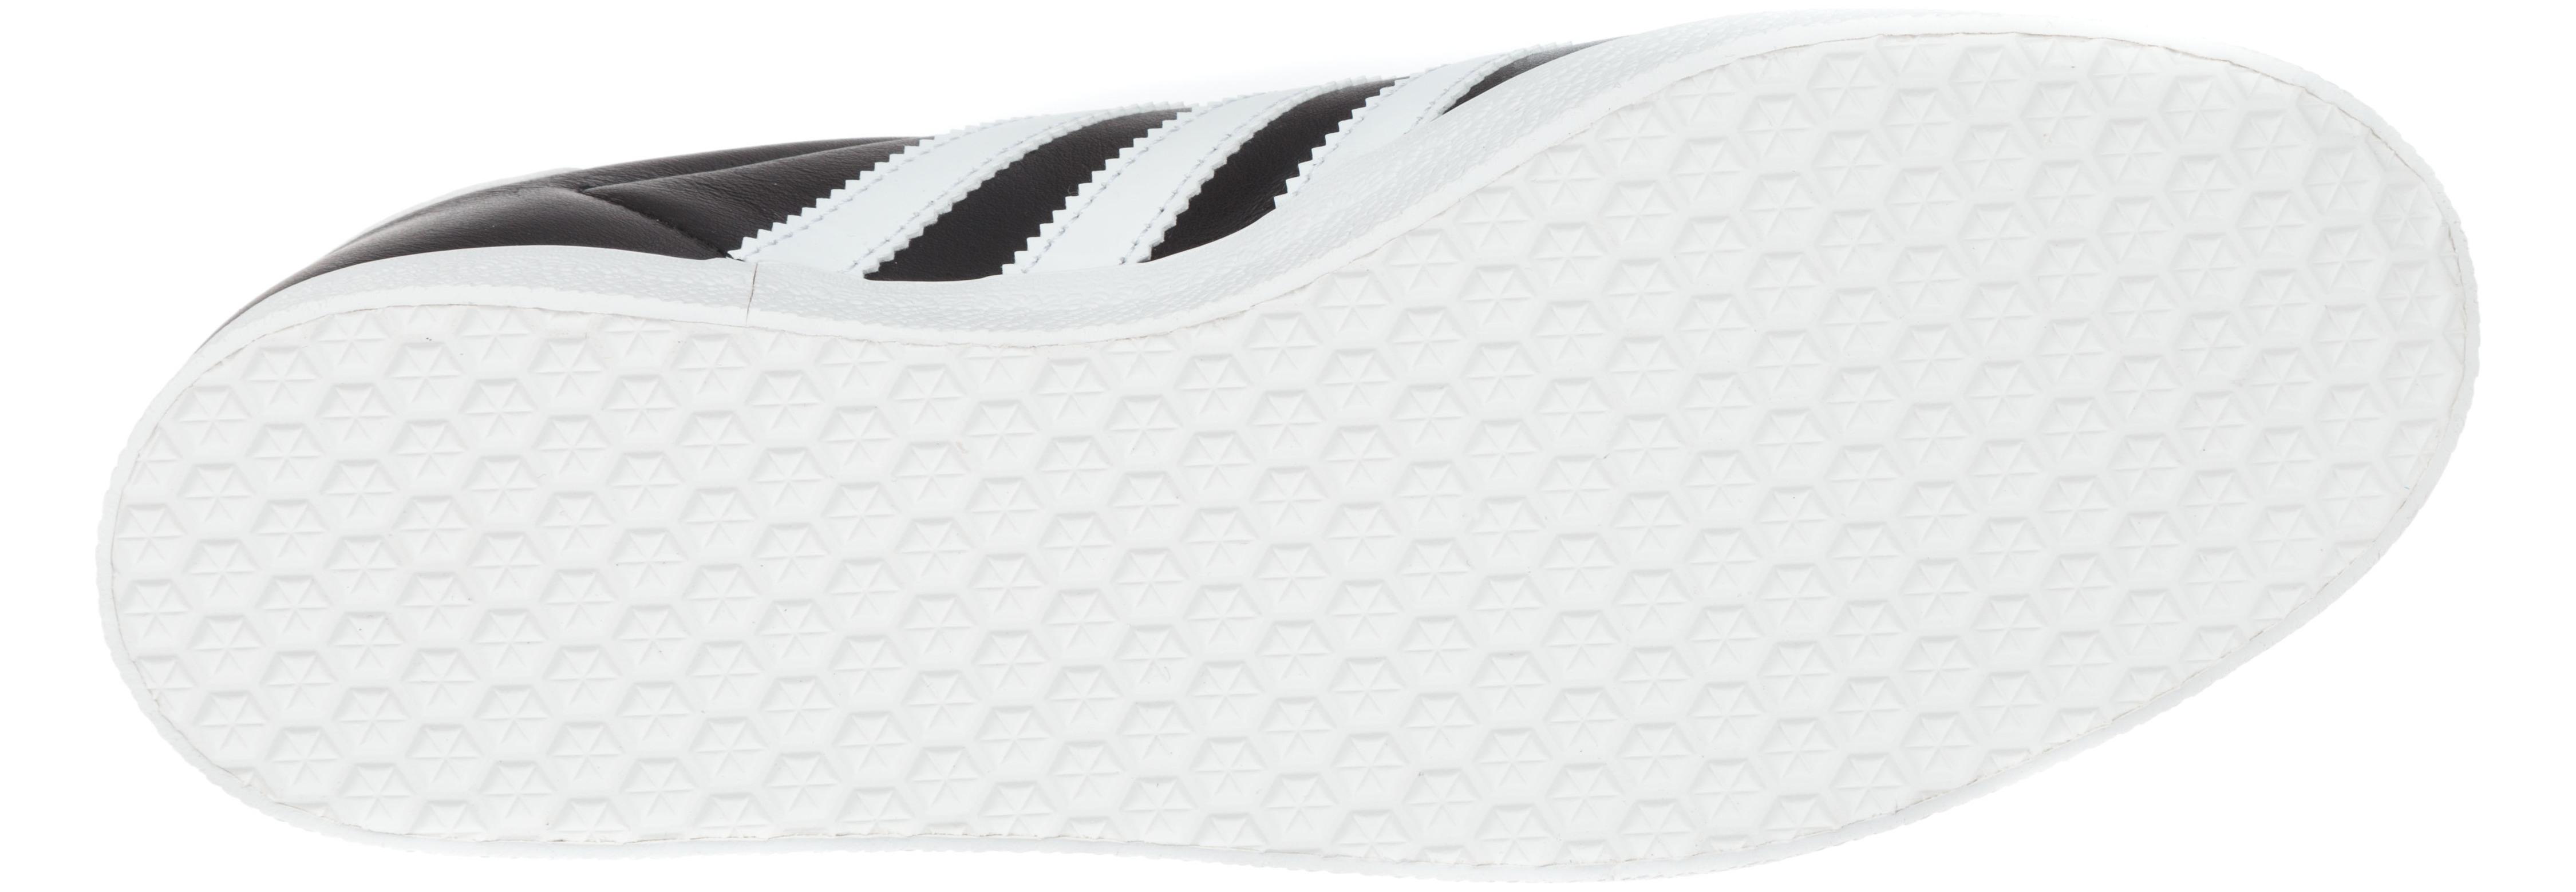 new concept fdc25 ef006 adidas Originals World Cup Gazelle Super Essential Sneakers CQ2794 crna